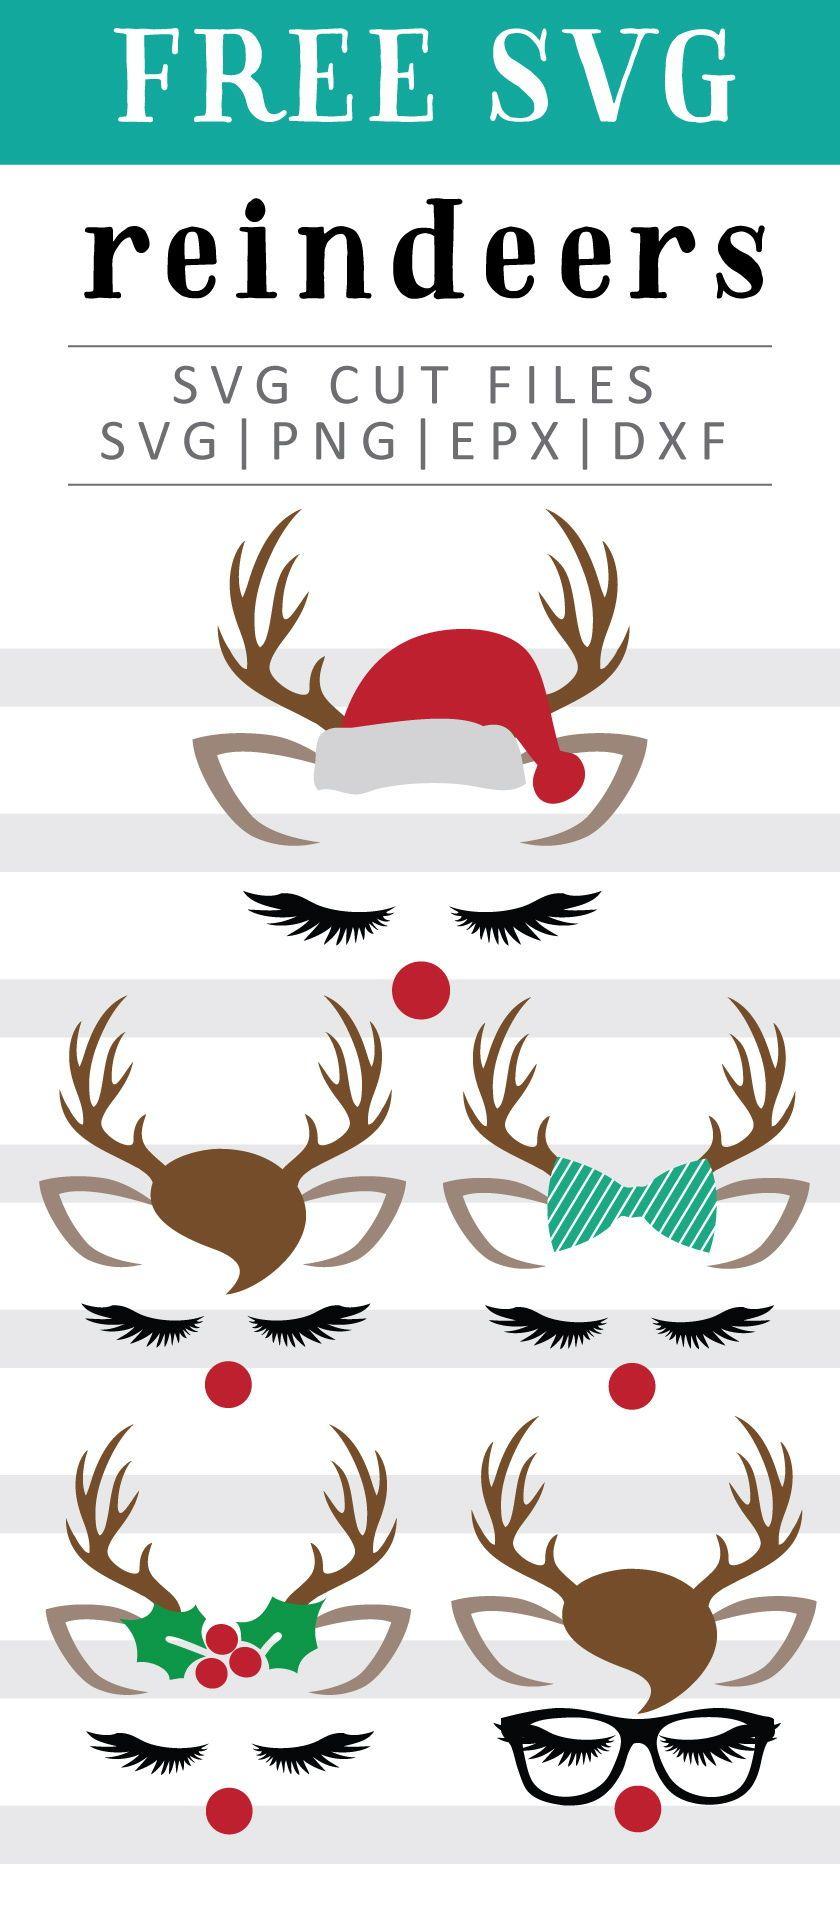 Reindeer Faces Free SVG, PNG, DXF, EPS Download by C. Design #cricutcrafts